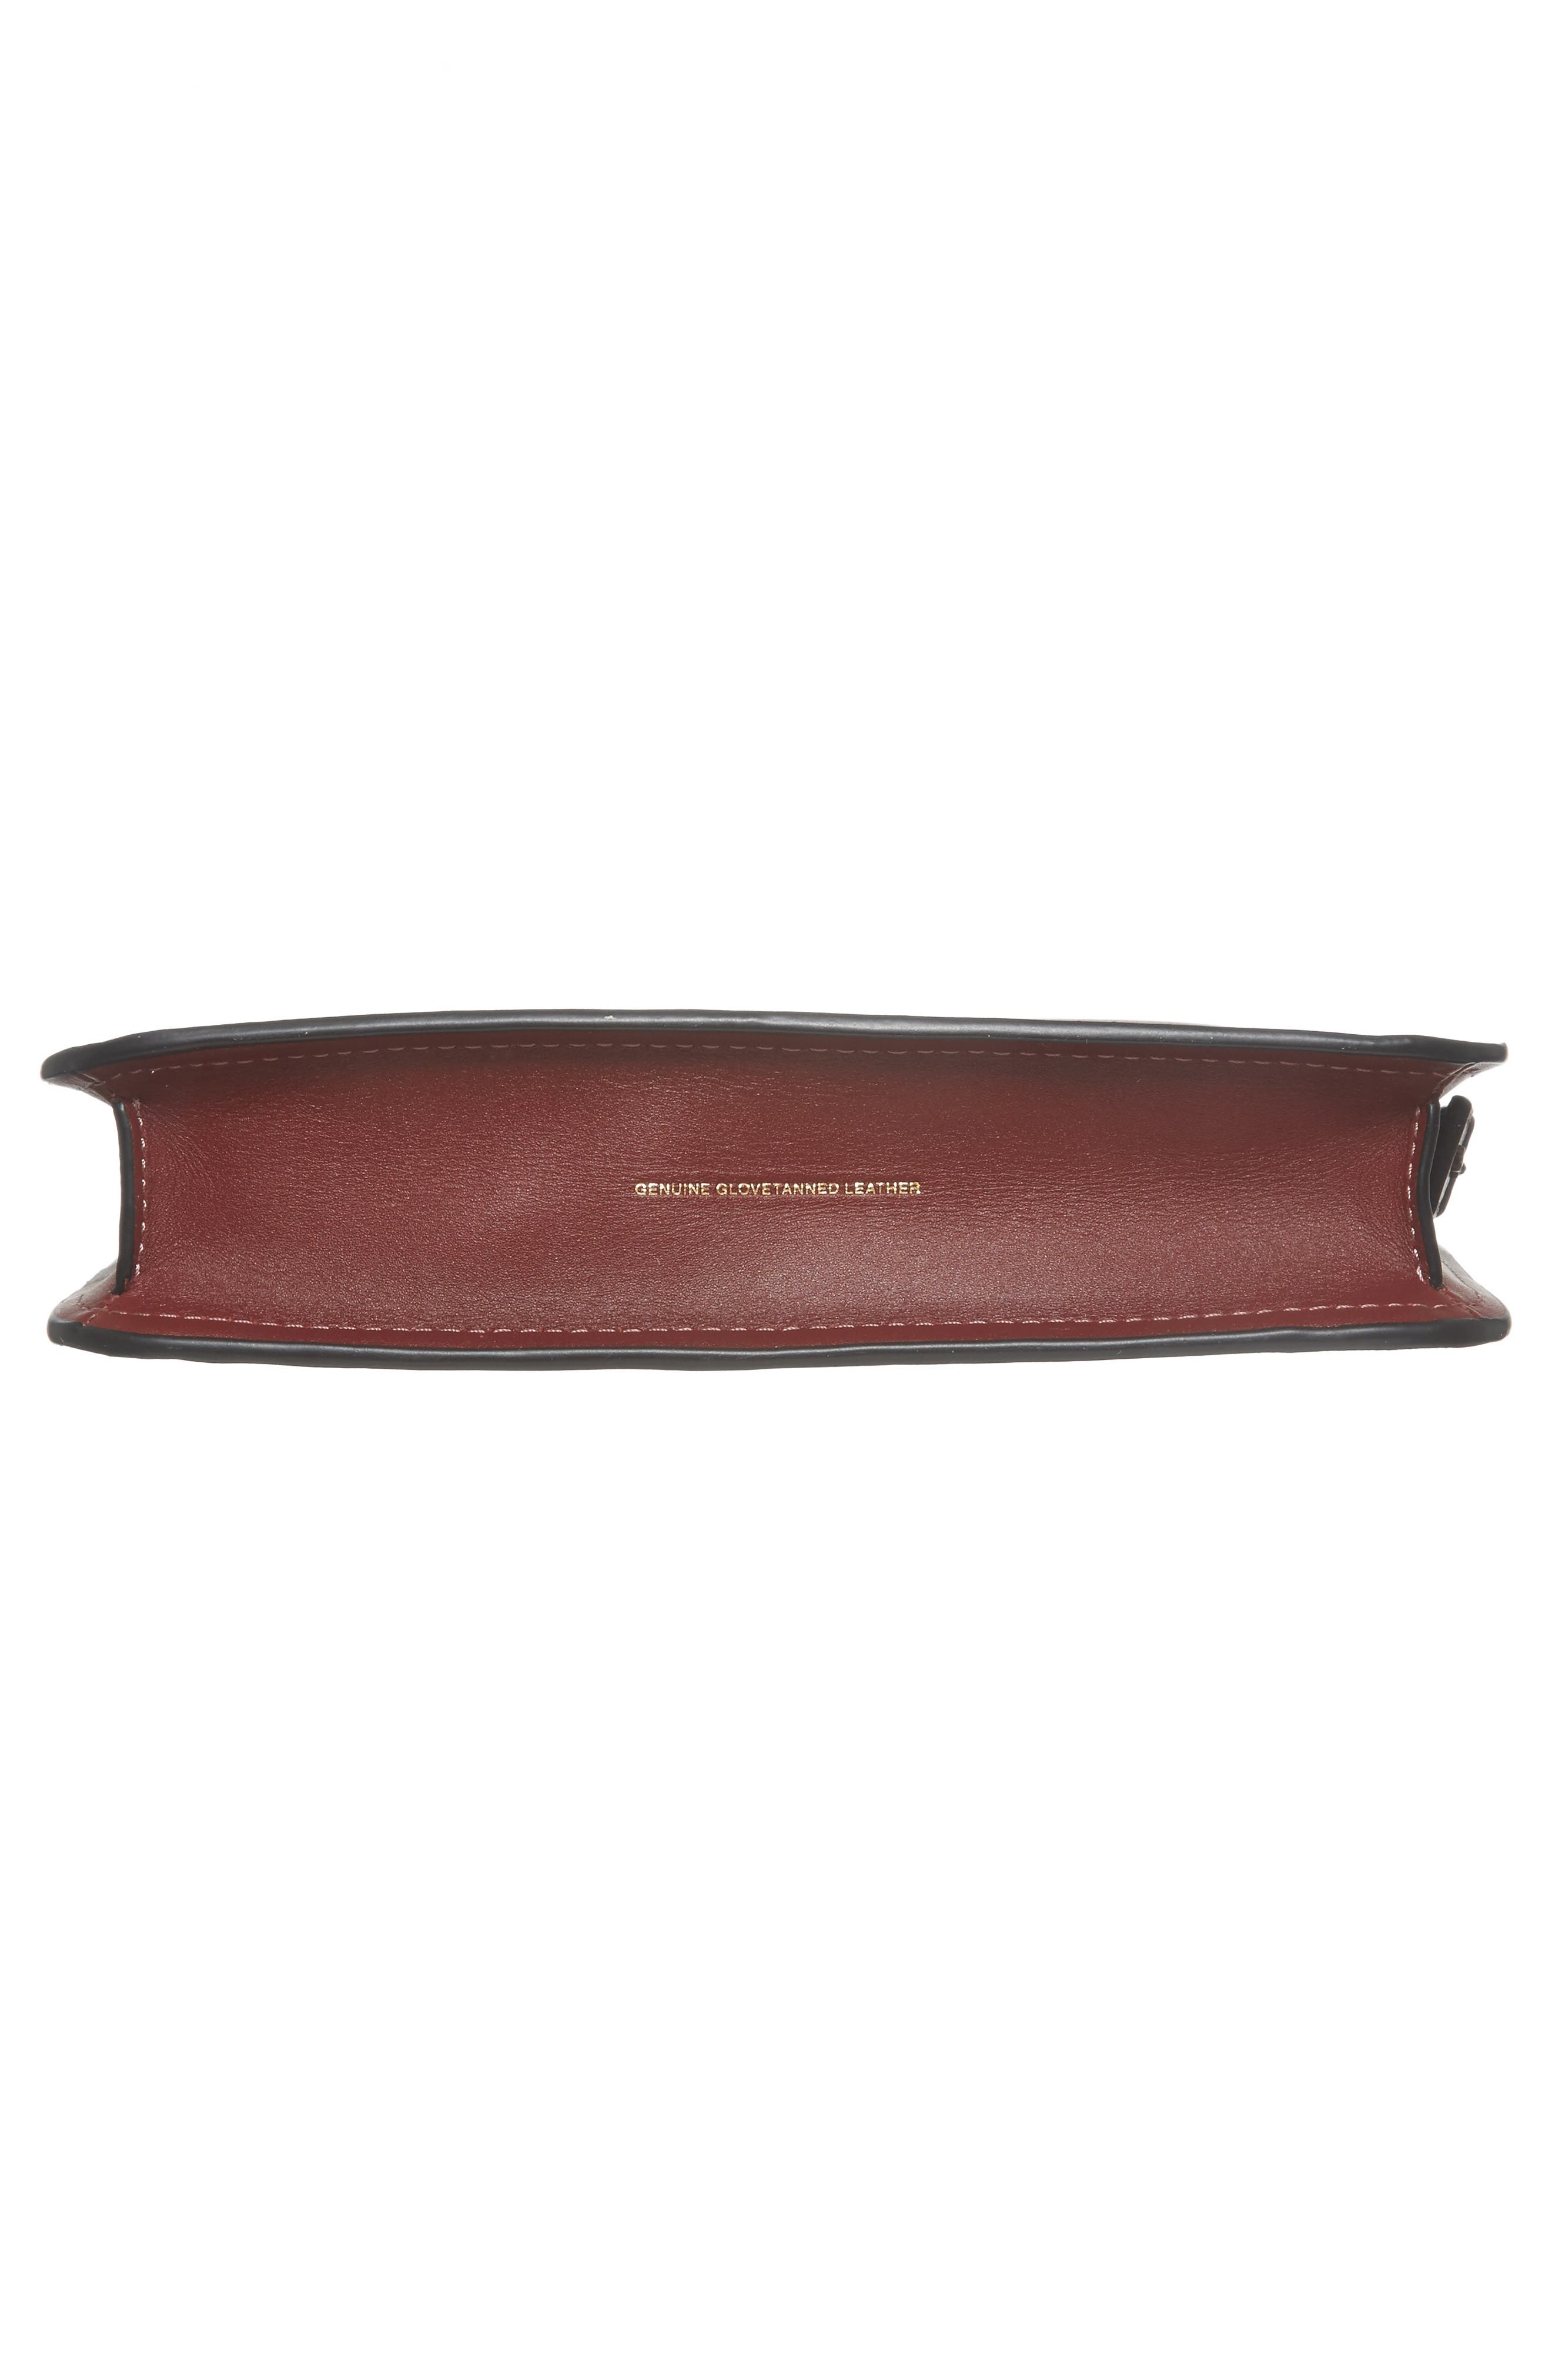 Soho Leather Crossbody Bag,                             Alternate thumbnail 6, color,                             614